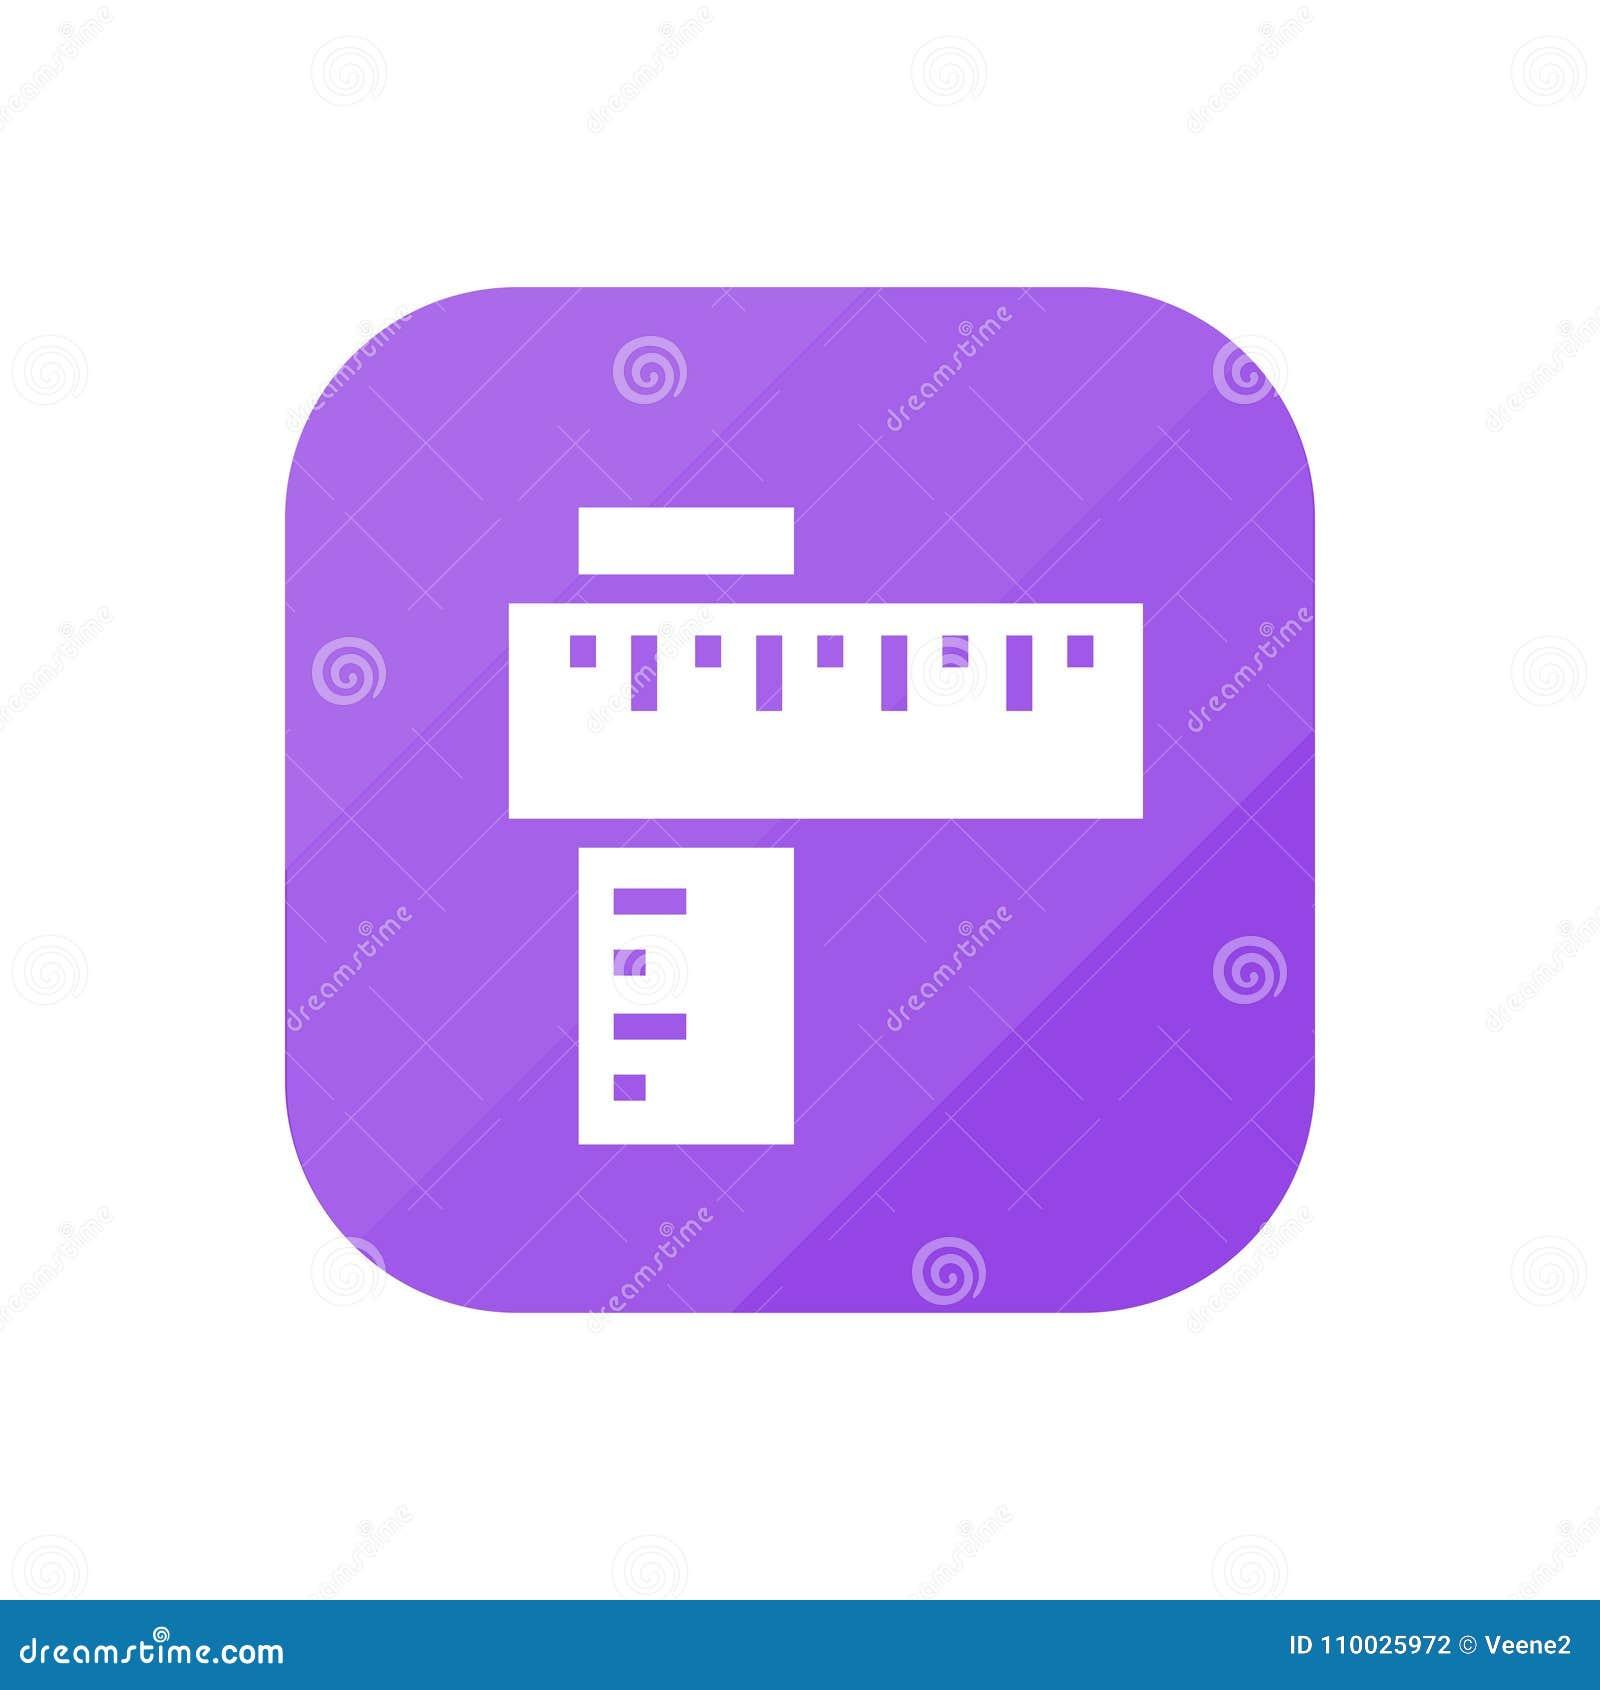 Heersers - App Pictogram